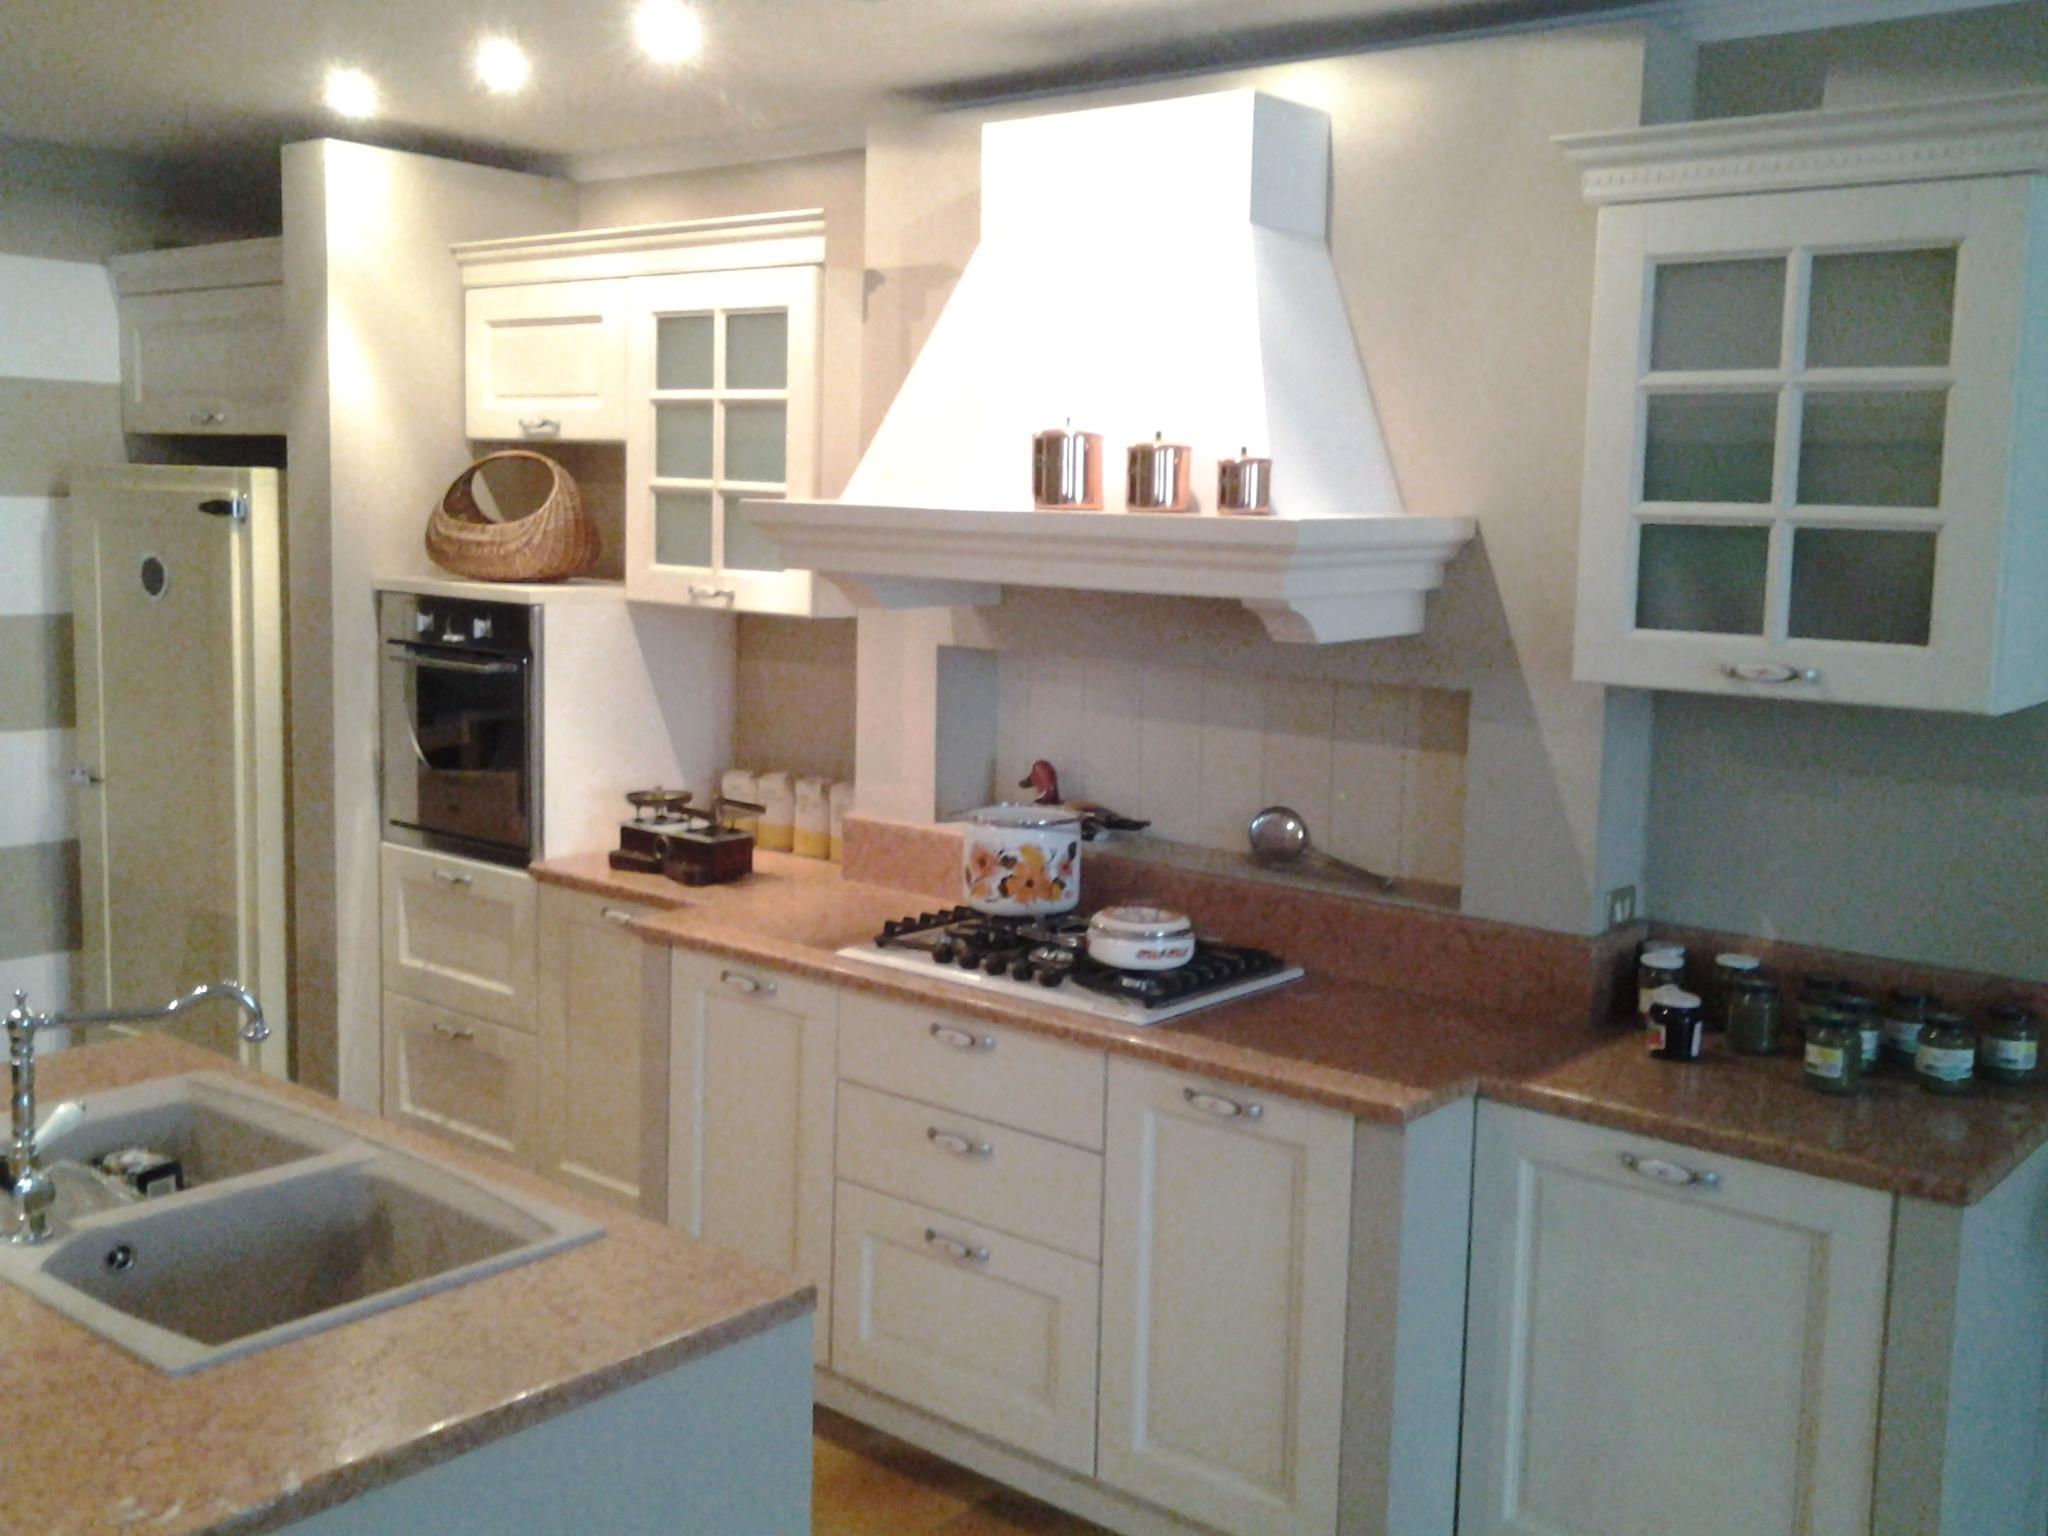 Arredo3 cucina virginia country legno magnolia cucine a - Arredo 3 cucine prezzi ...